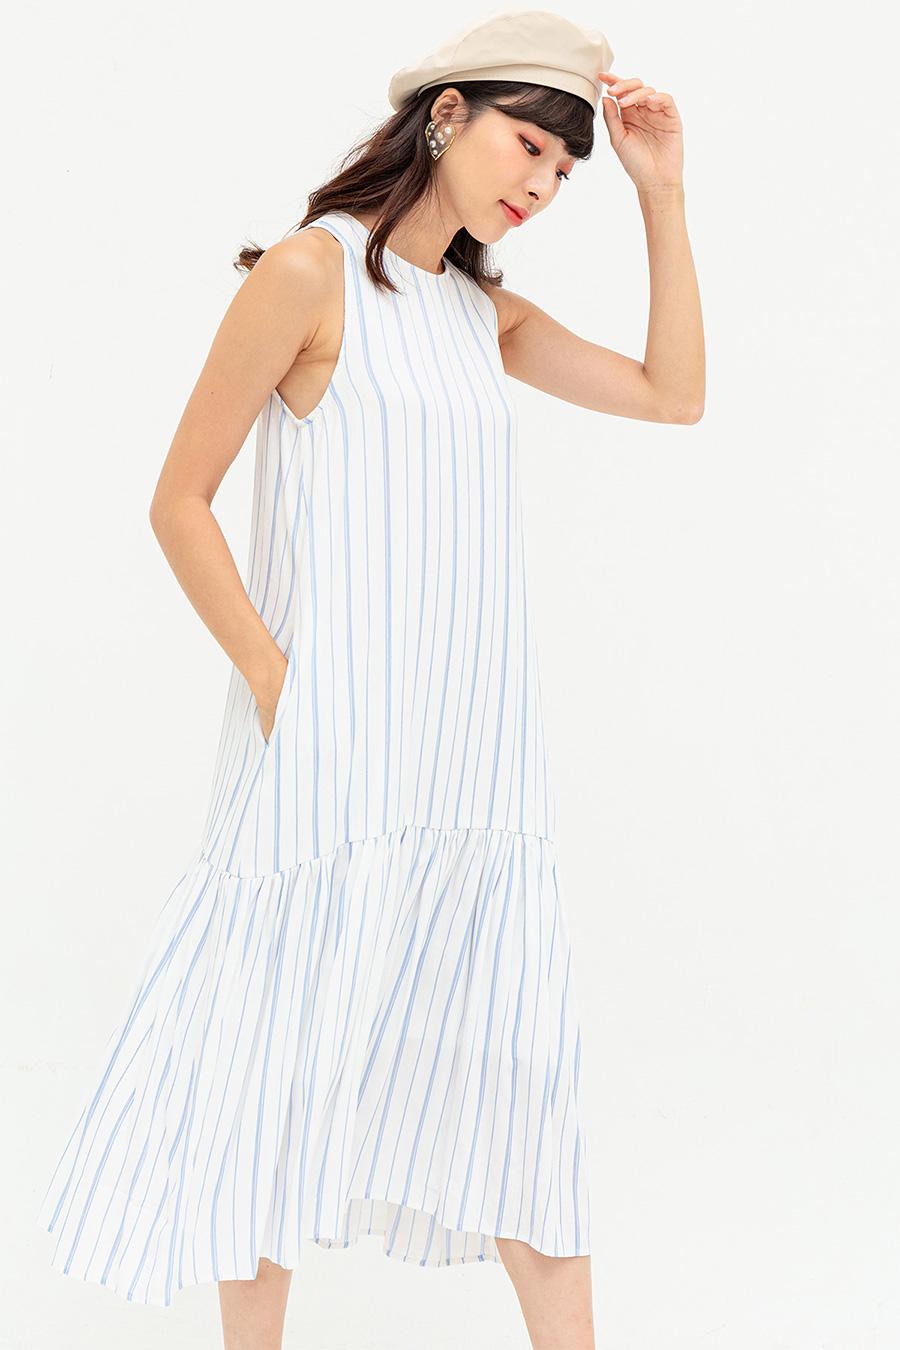 MIRANDA DRESS - BLUE HAZE STRIPE [BY MODPARADE]